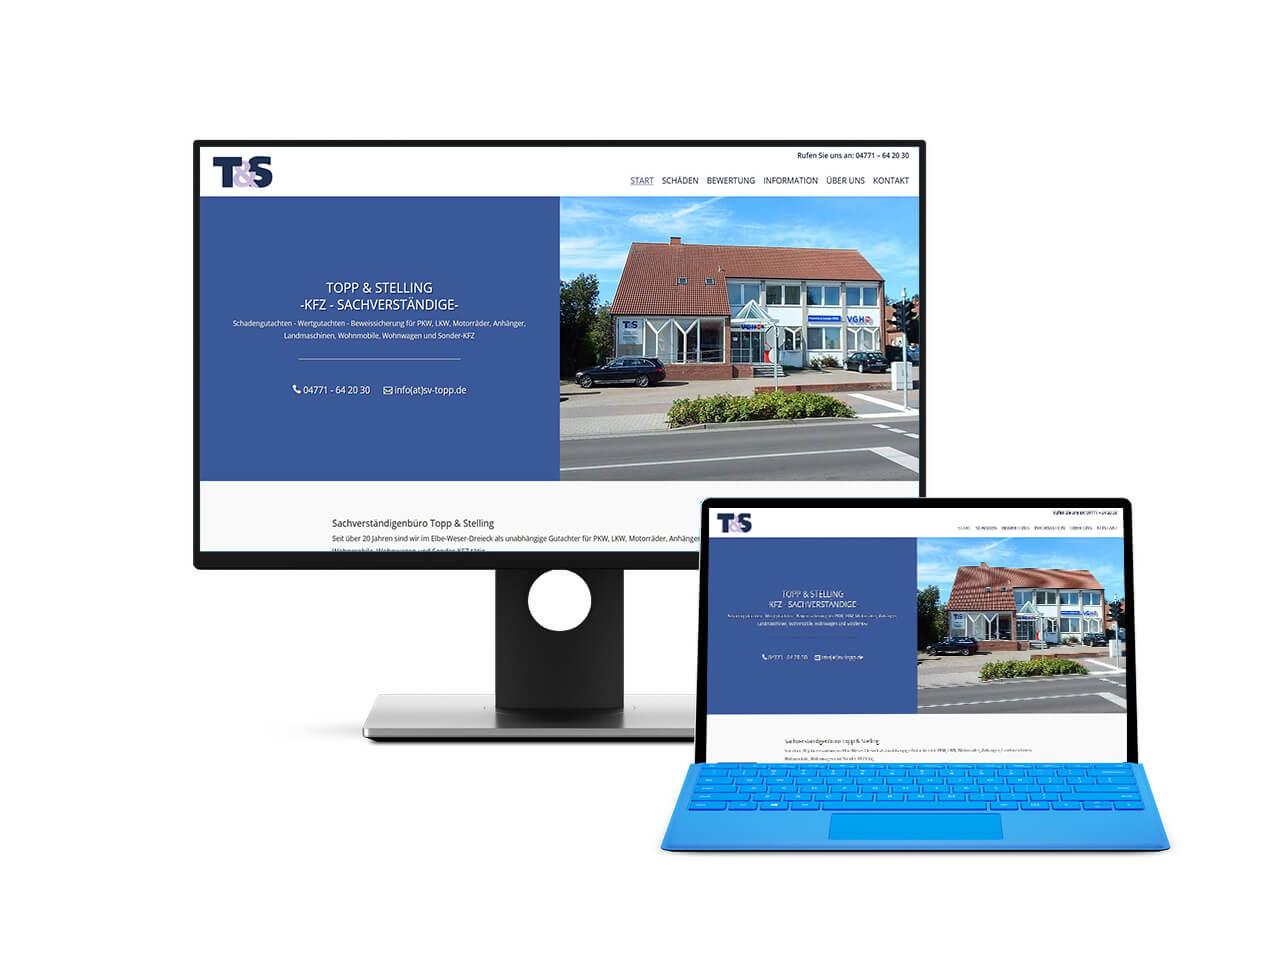 Webdesign Hemmoor Website fuer Topp und Stelling Kfz Sachverstaendige aus Hemmoor